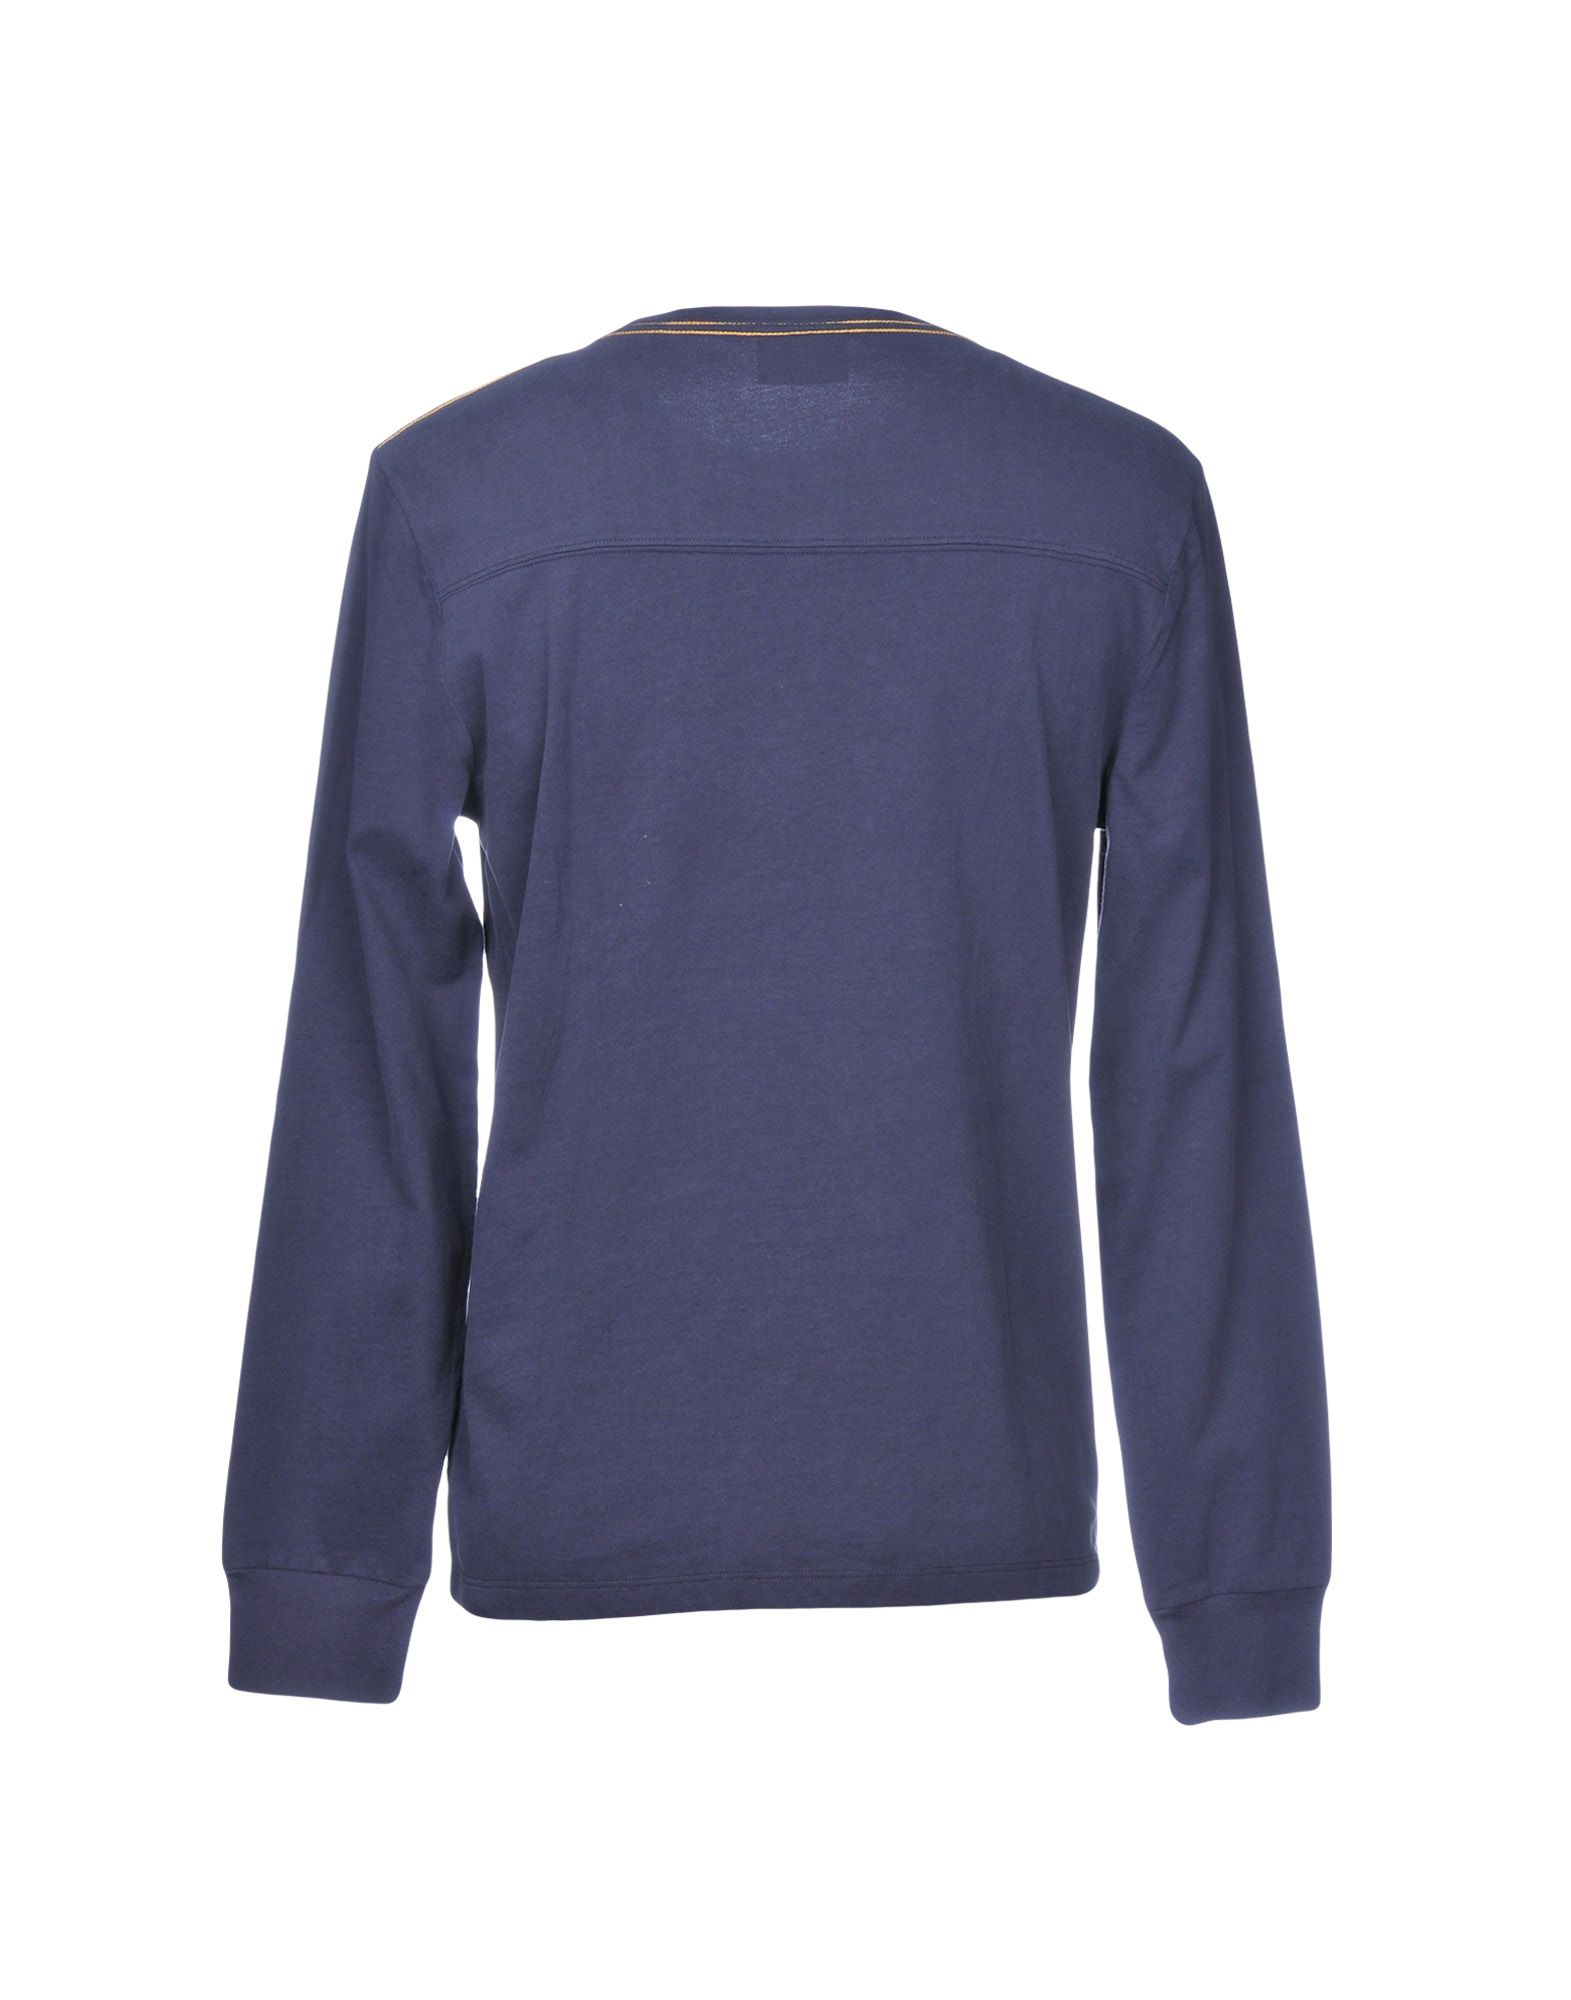 T-Shirt 12191839VP Sweet Years Uomo - 12191839VP T-Shirt edddd3